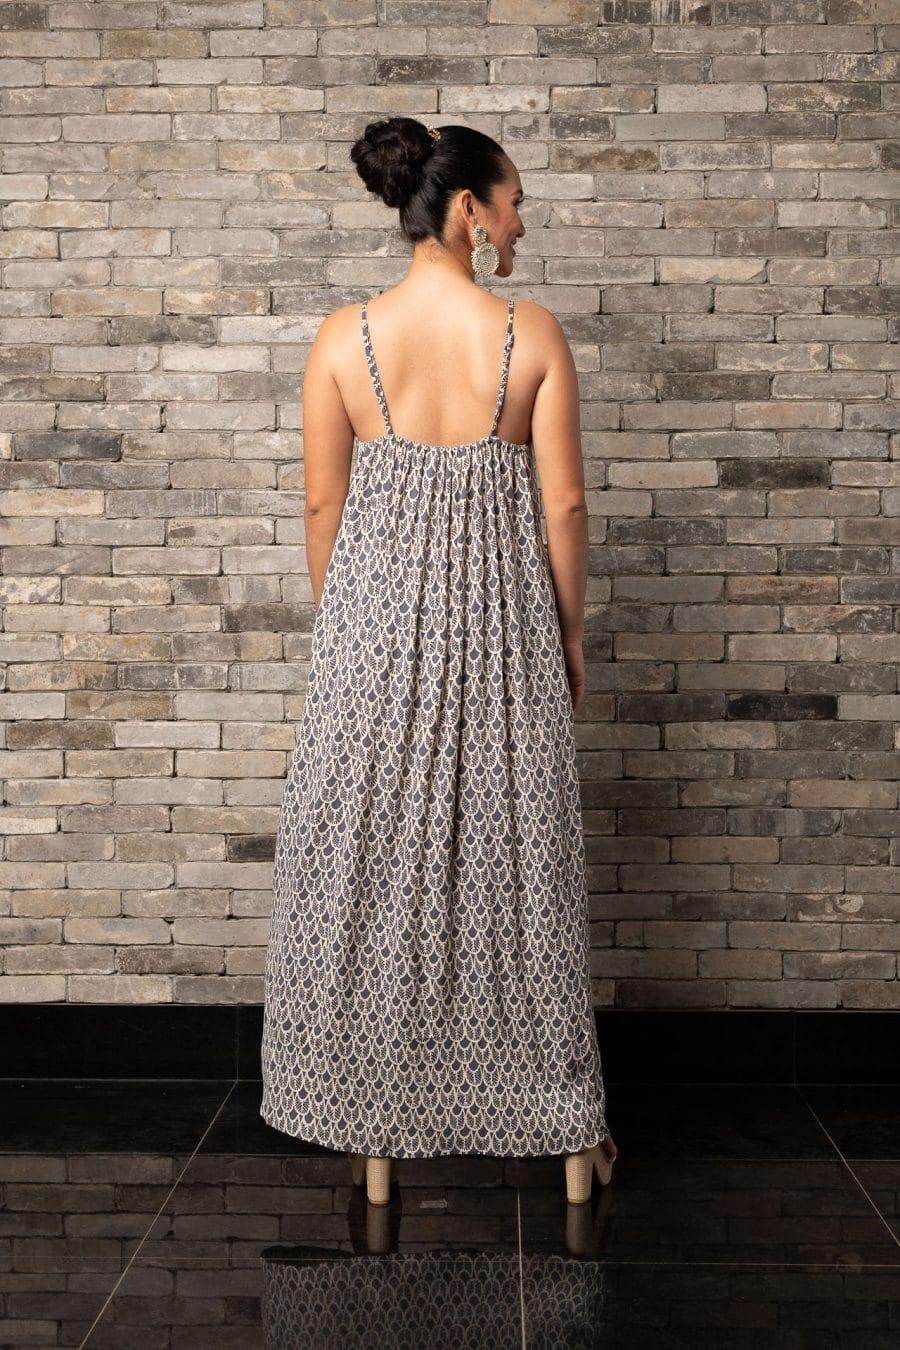 Model wearing Lei Dress in Pavement Moonbeam Palulu Pattern - Back View